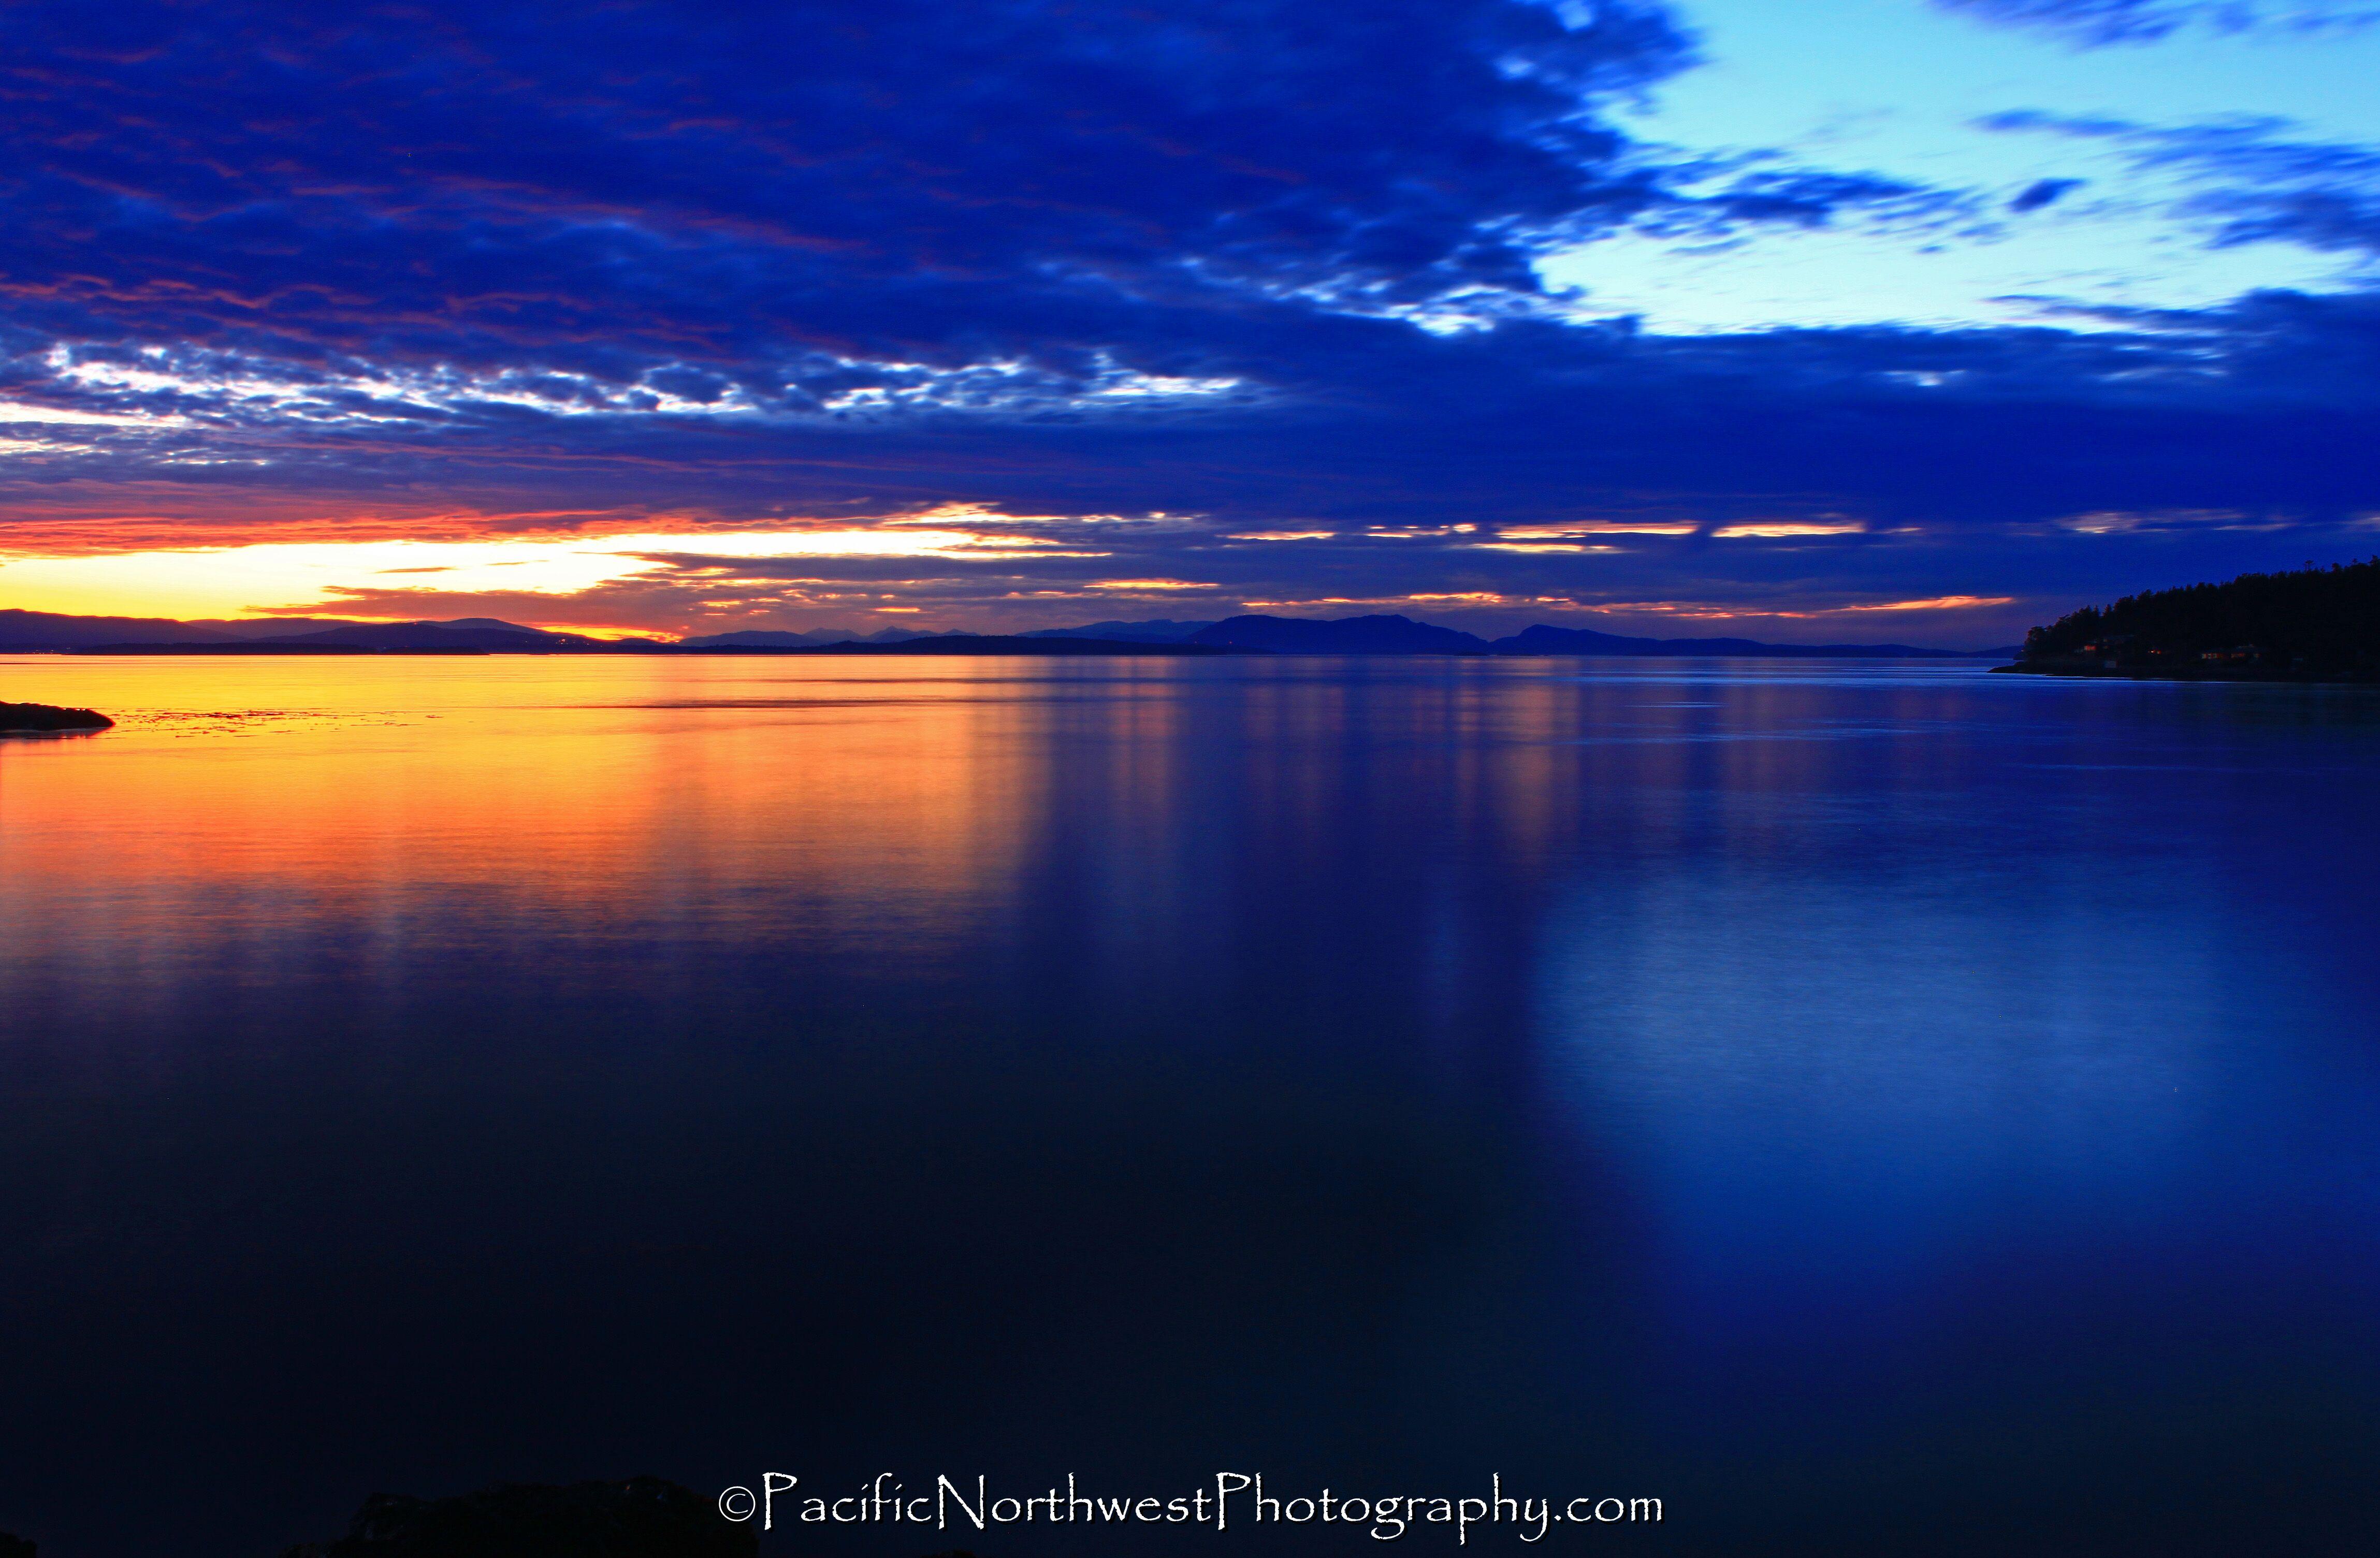 Sunset on the San Juan Islands